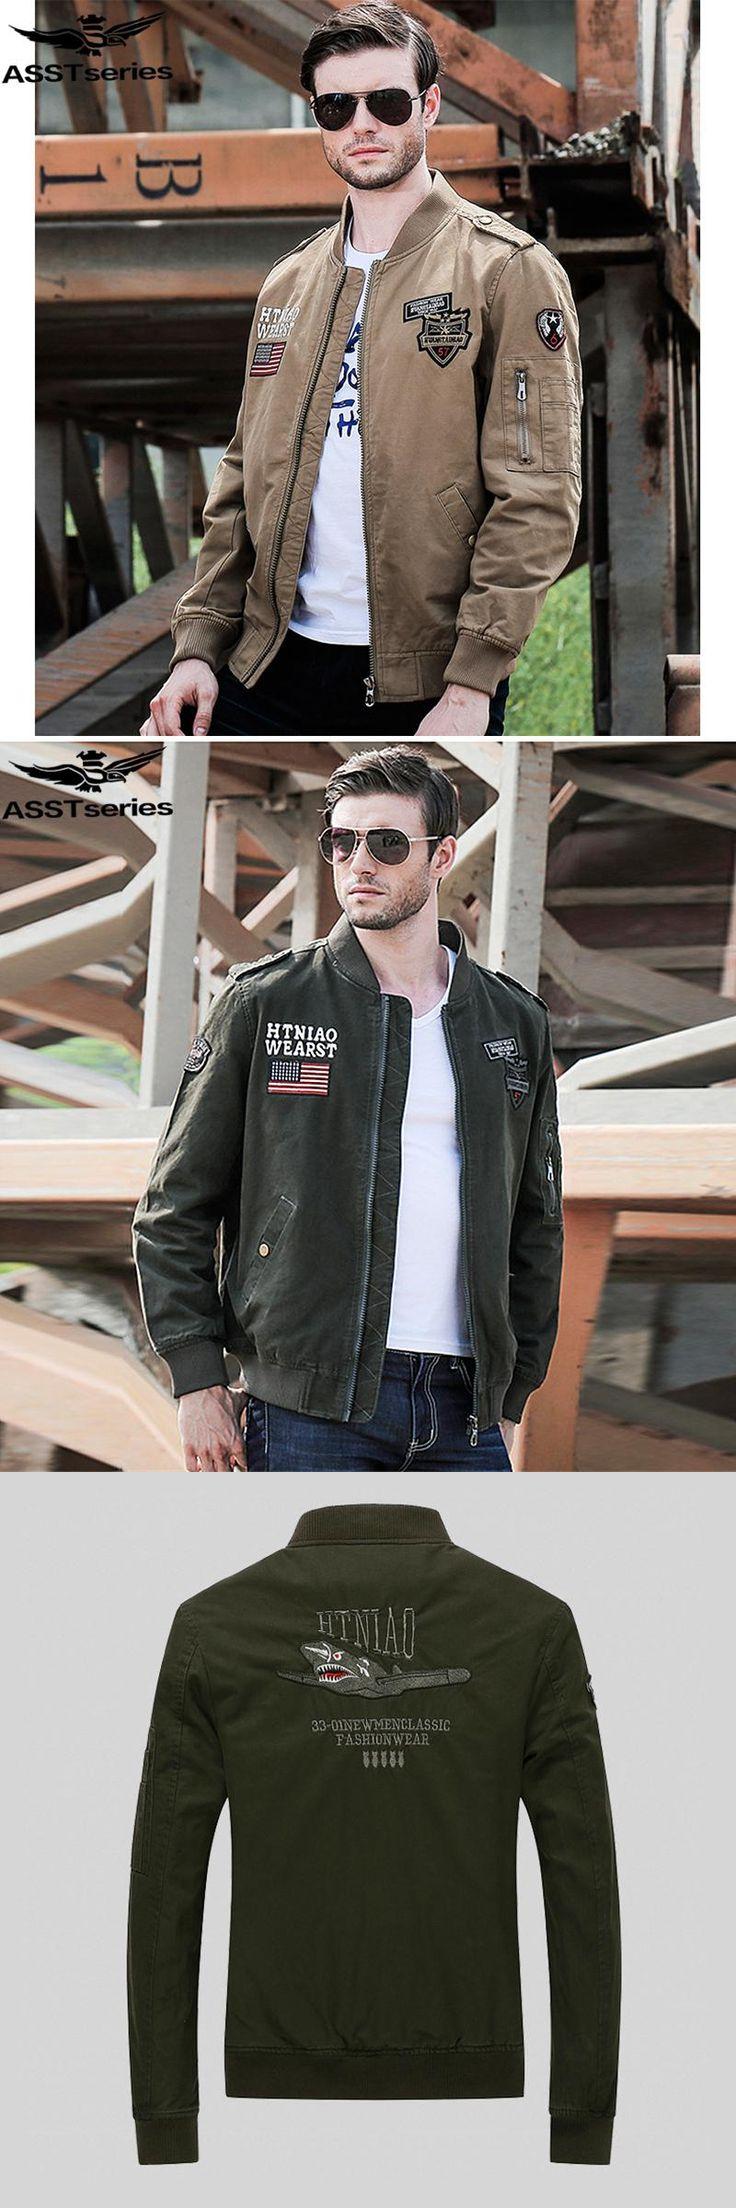 Military Bomber Jacket Men Men's Tactical Army Jackets And Coats Chaqueta Militar Hombre Outwear Chaqueta Cazadoras Hombre.DA16